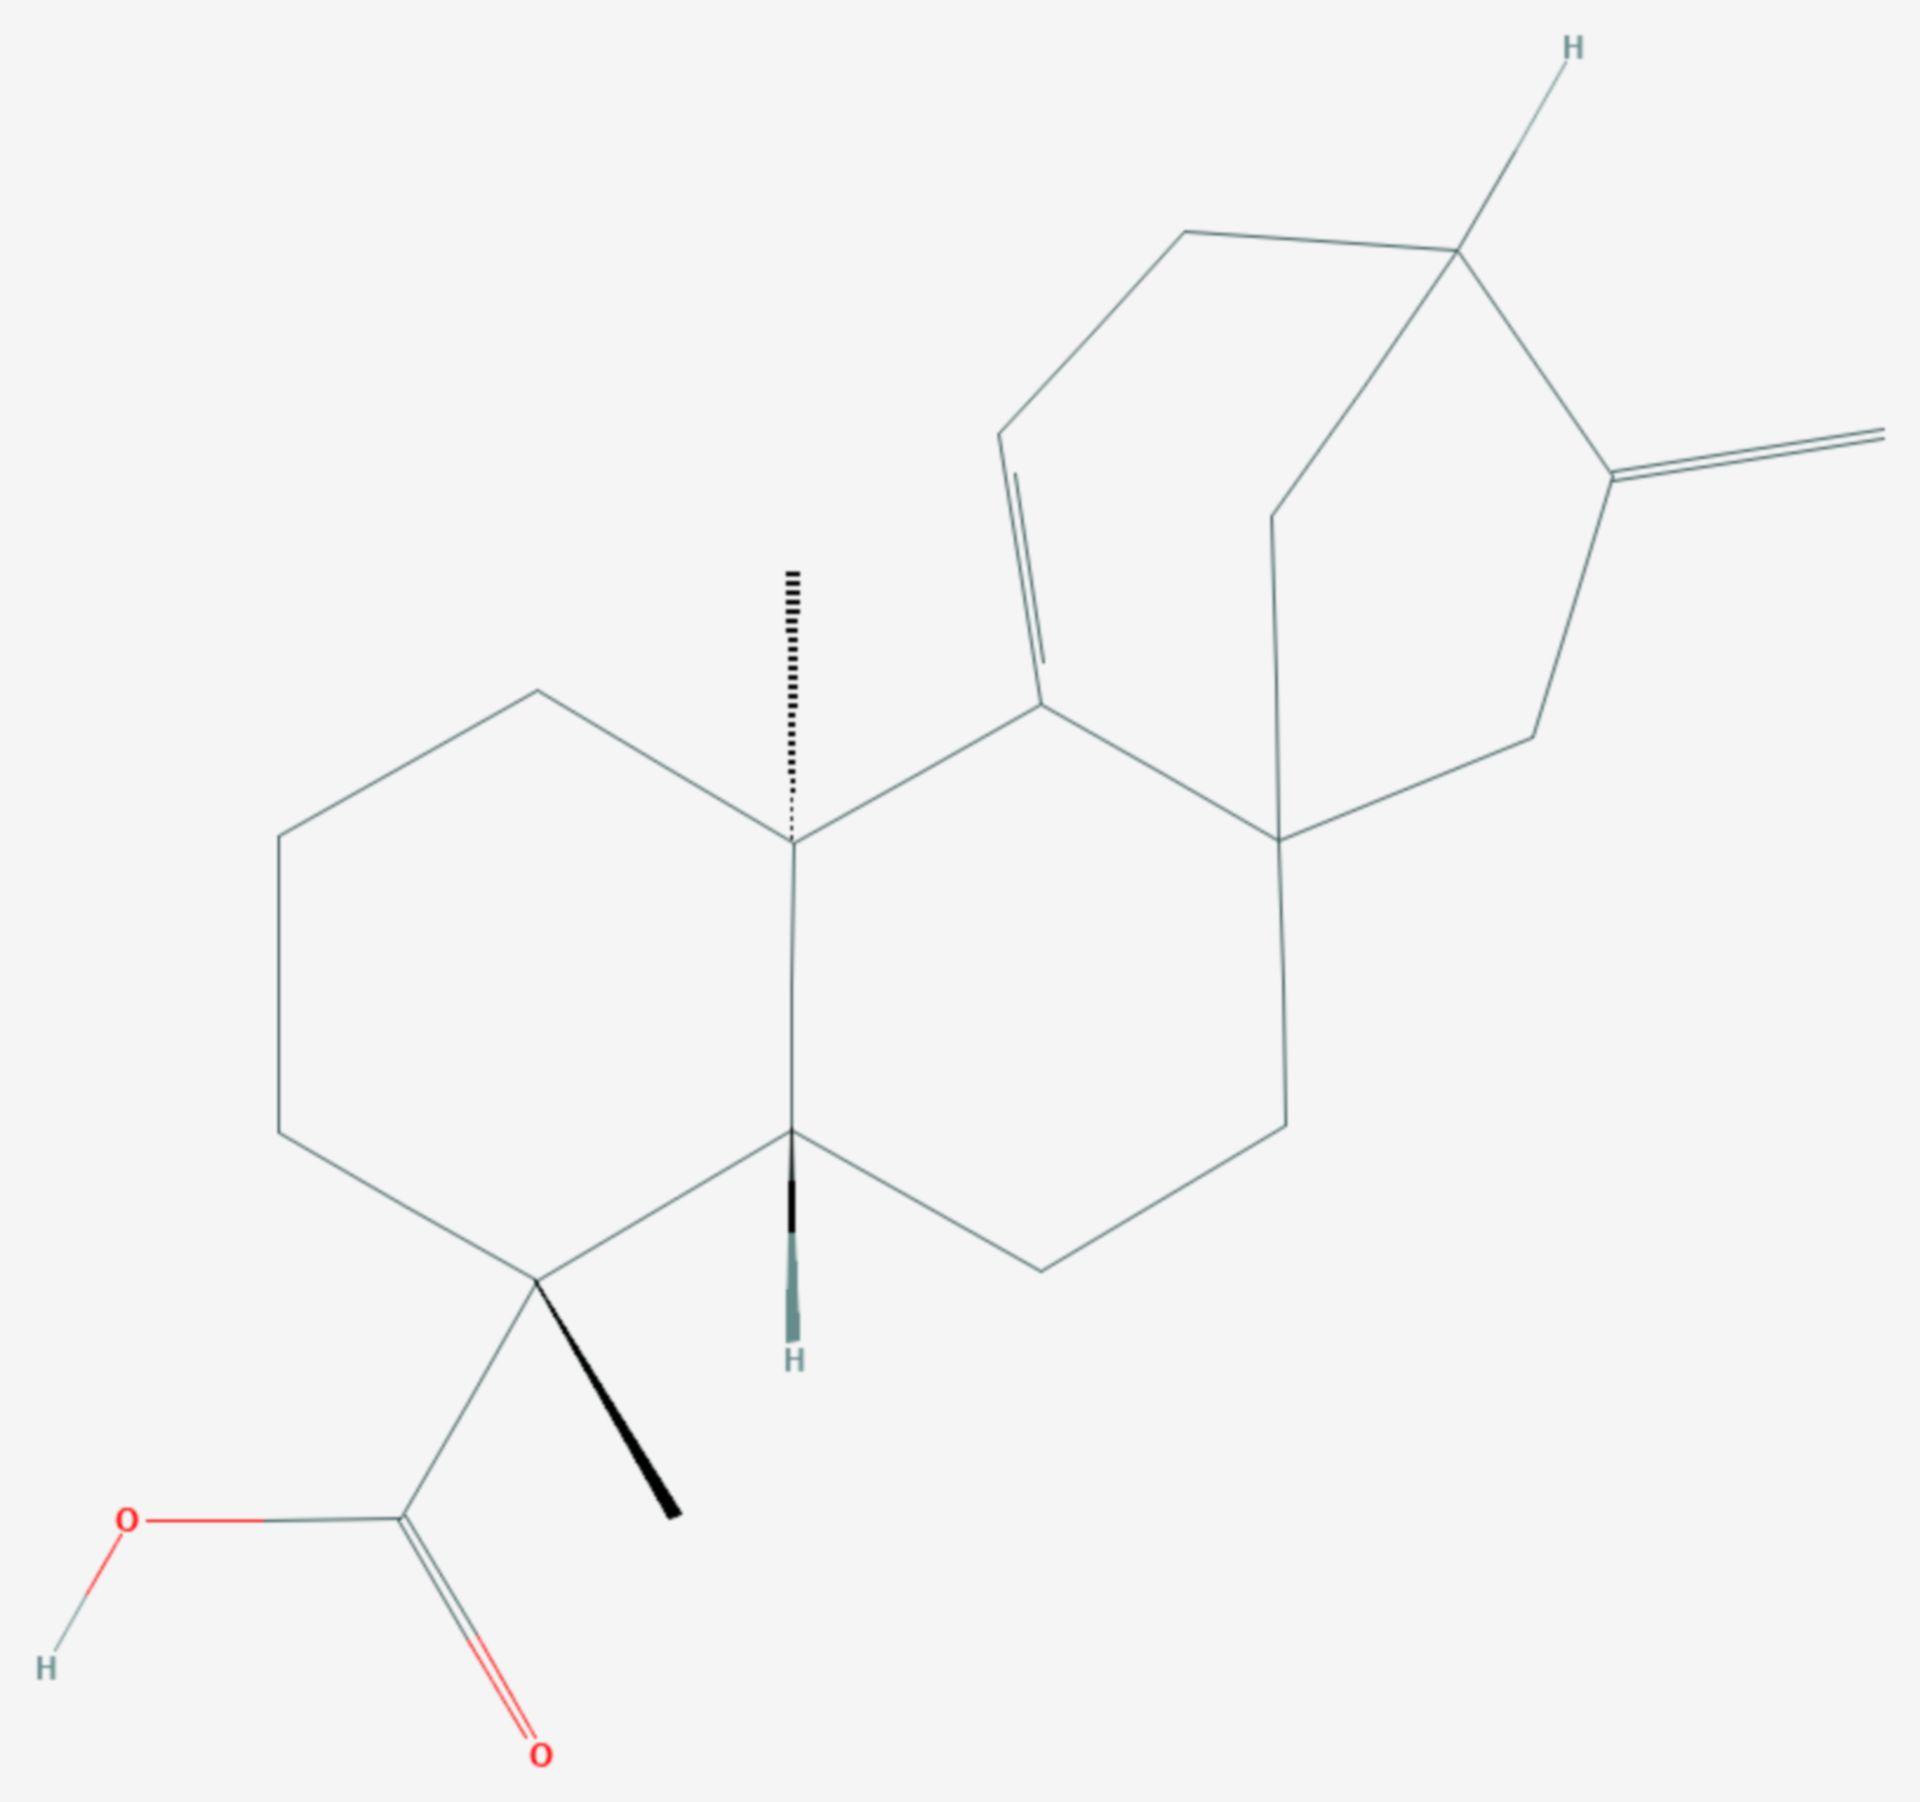 Eisen(II)-acetat (Strukturformel)